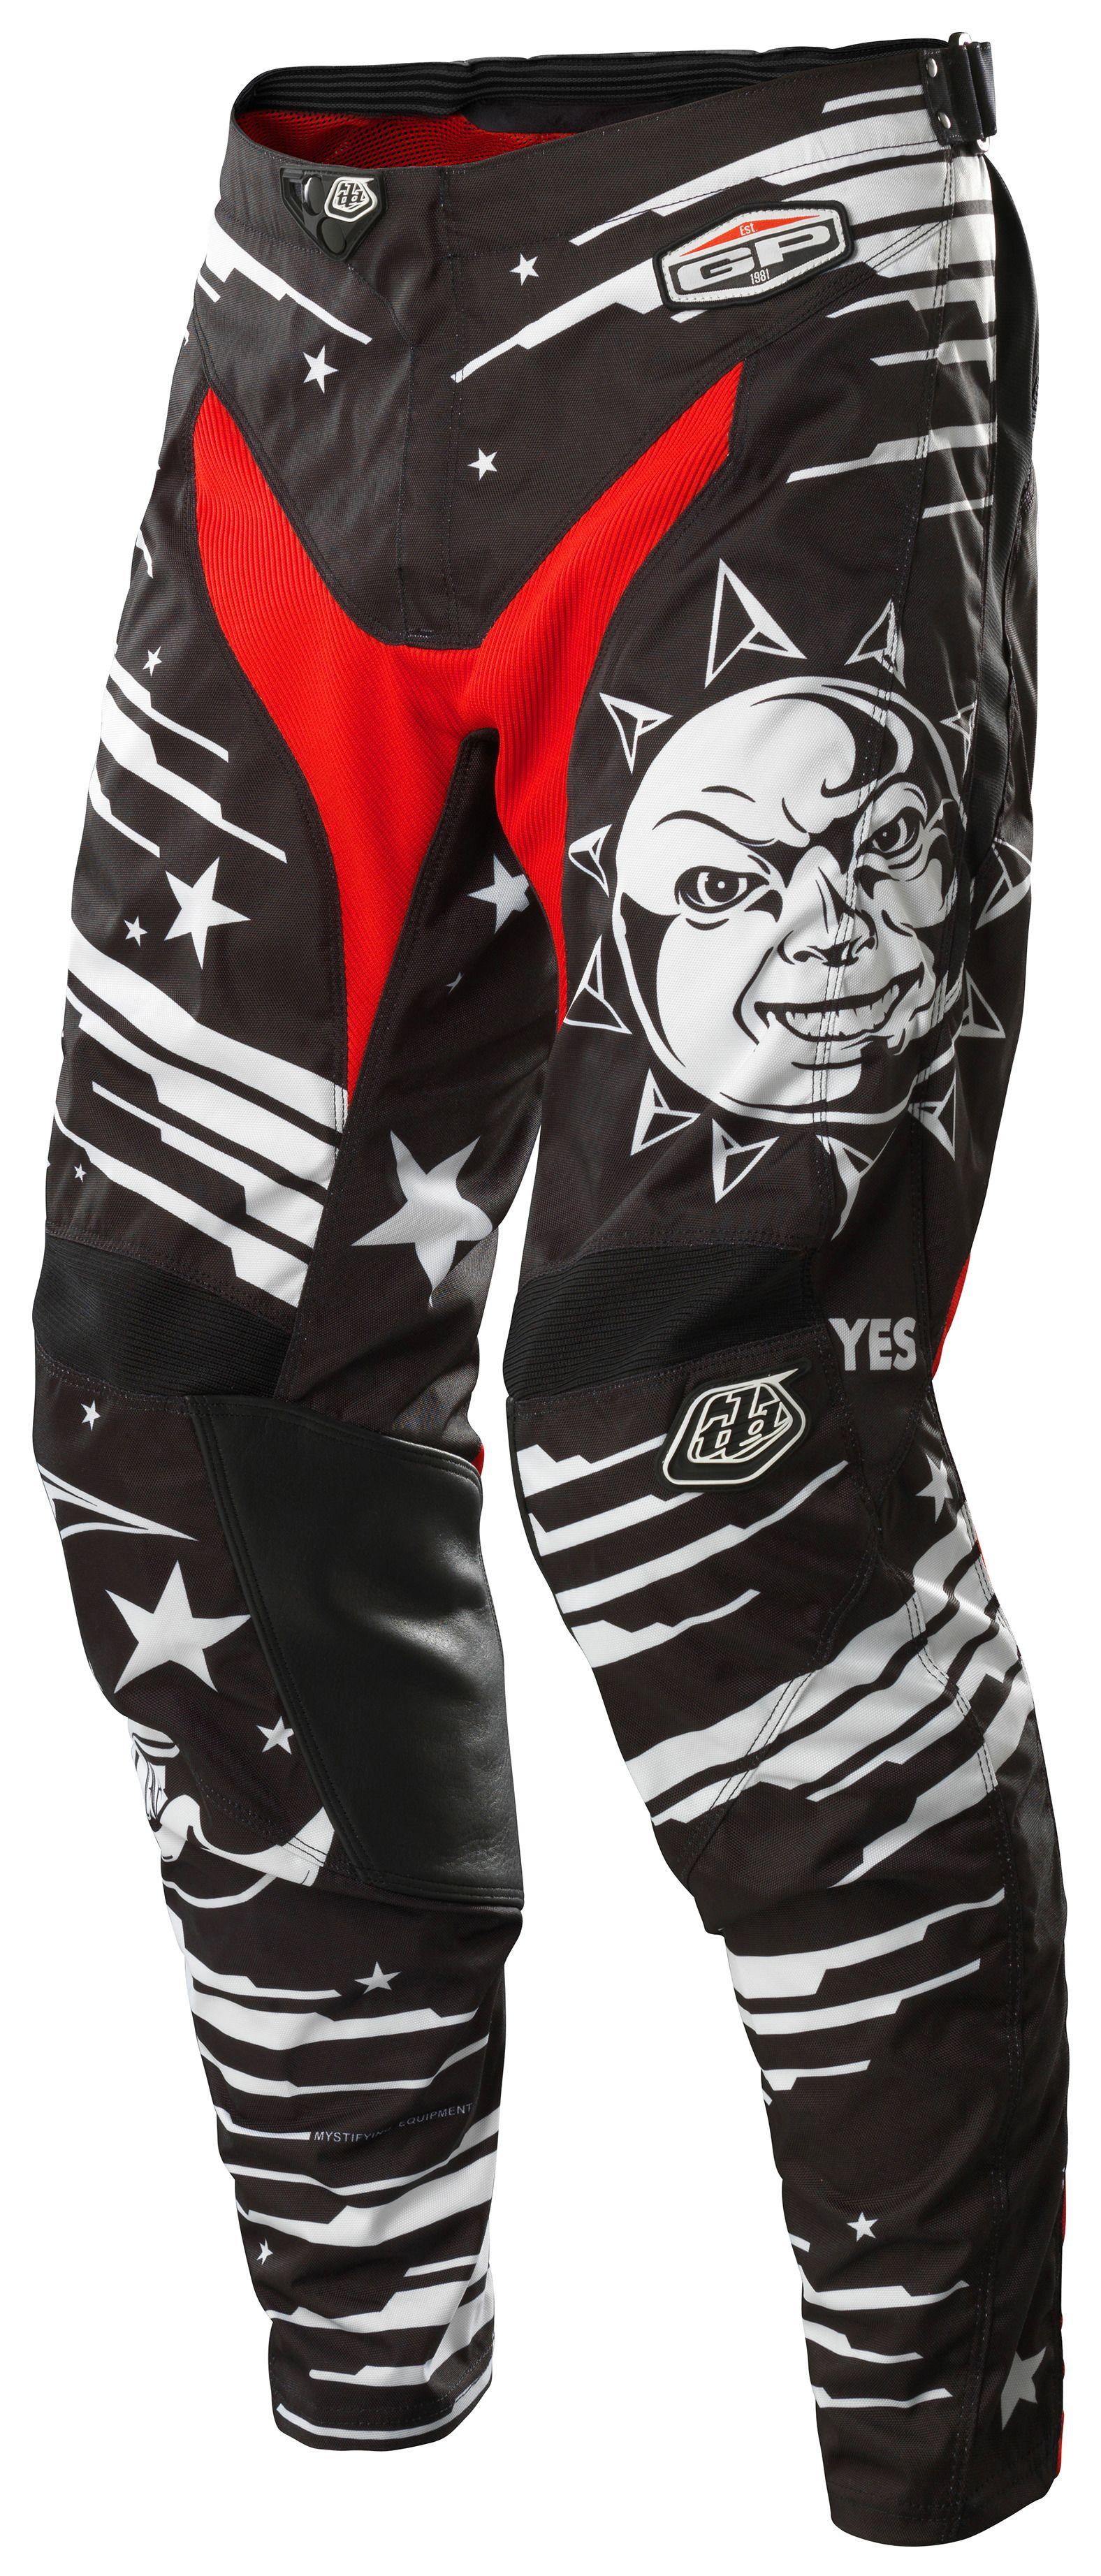 eddeddd9 Troy Lee GP Ouija Pants - Cycle Gear